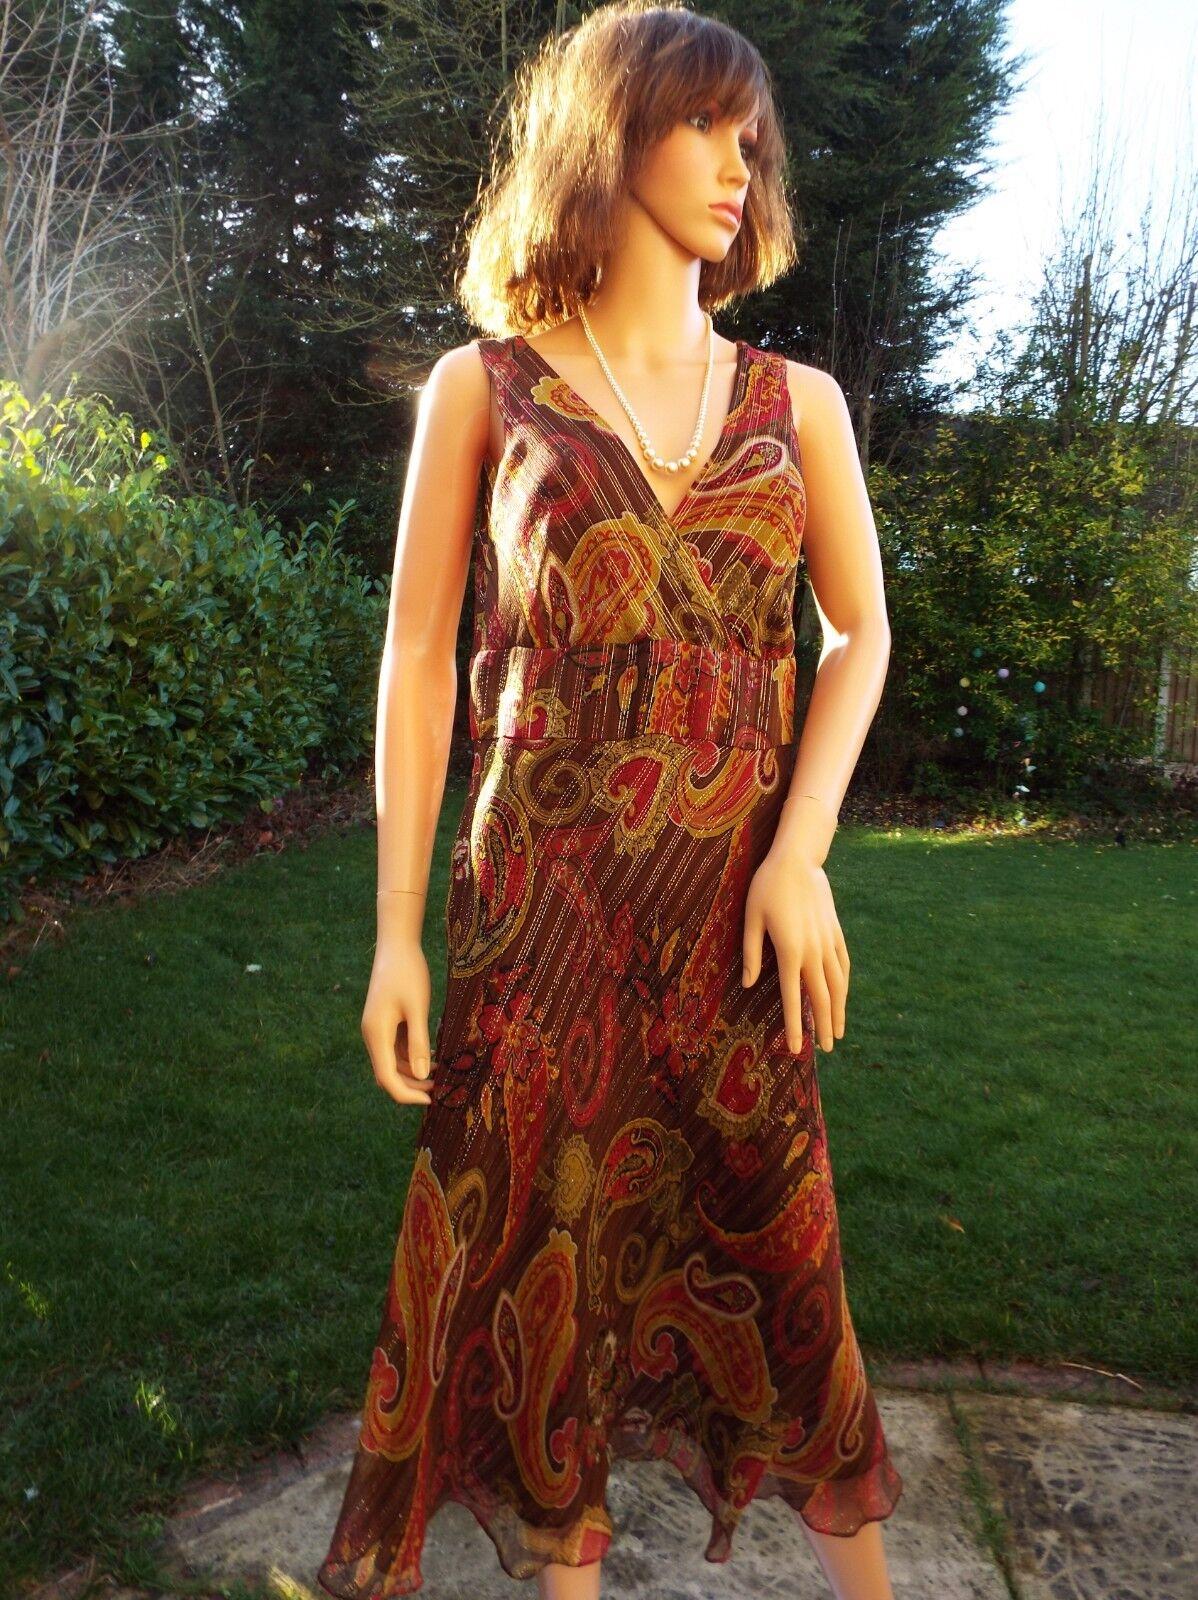 Planet pure silk brown metallic gold floral bias dress 30s style Art deco UK12